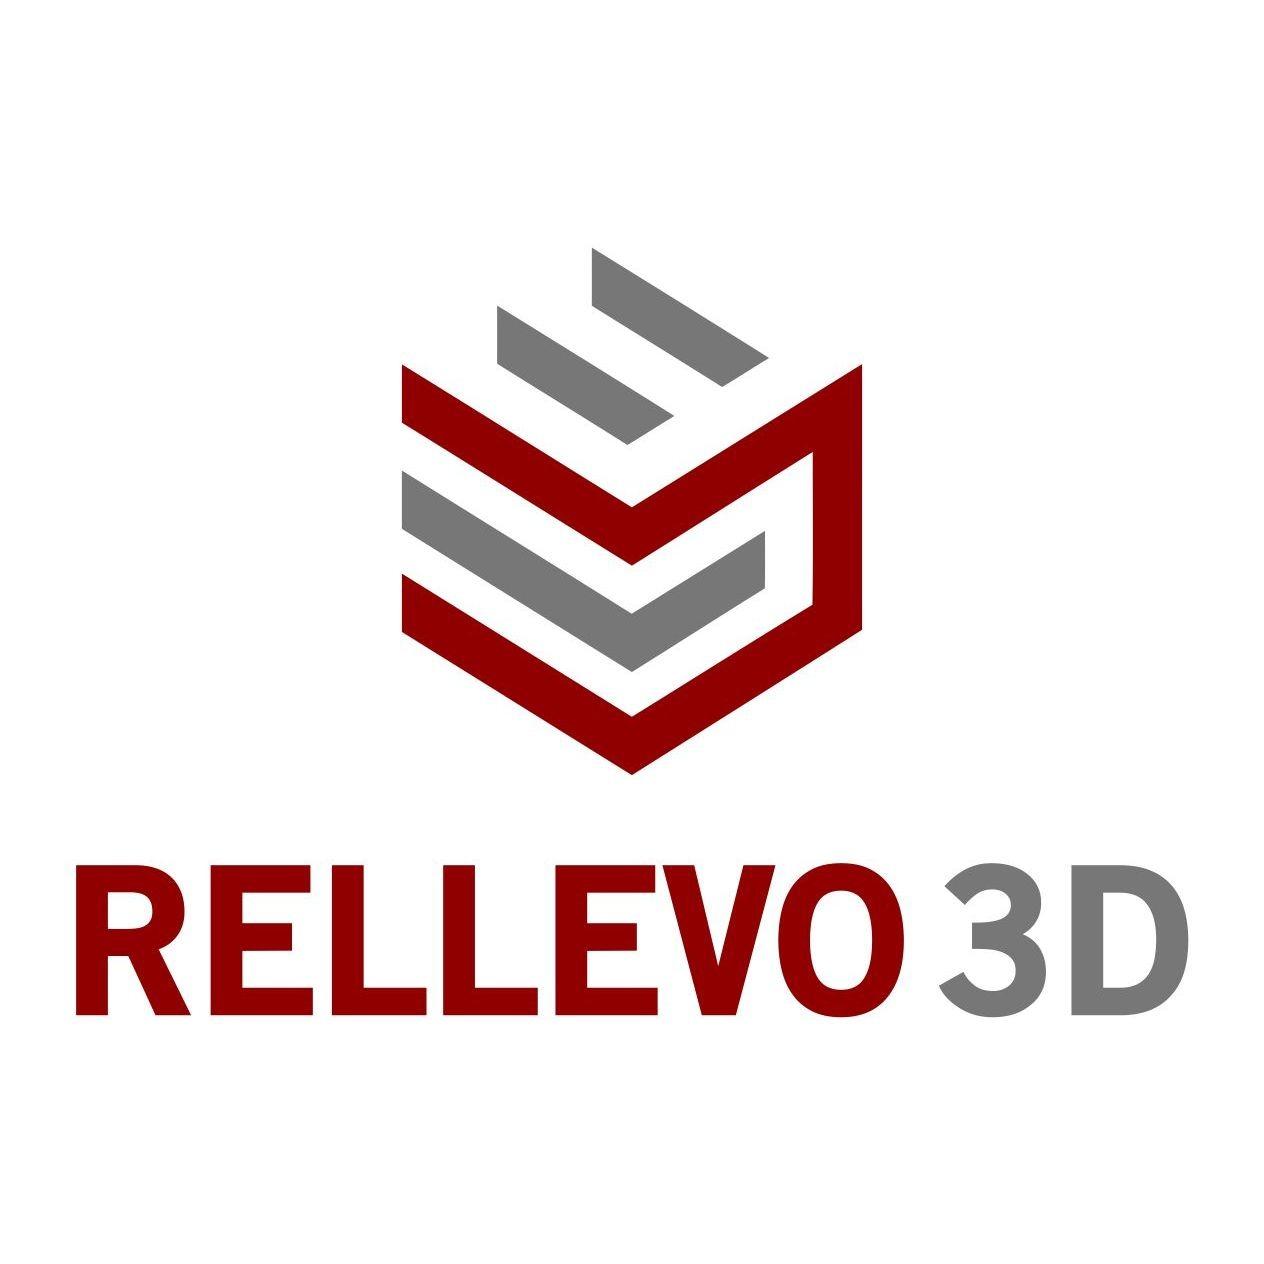 RELLEVO3D